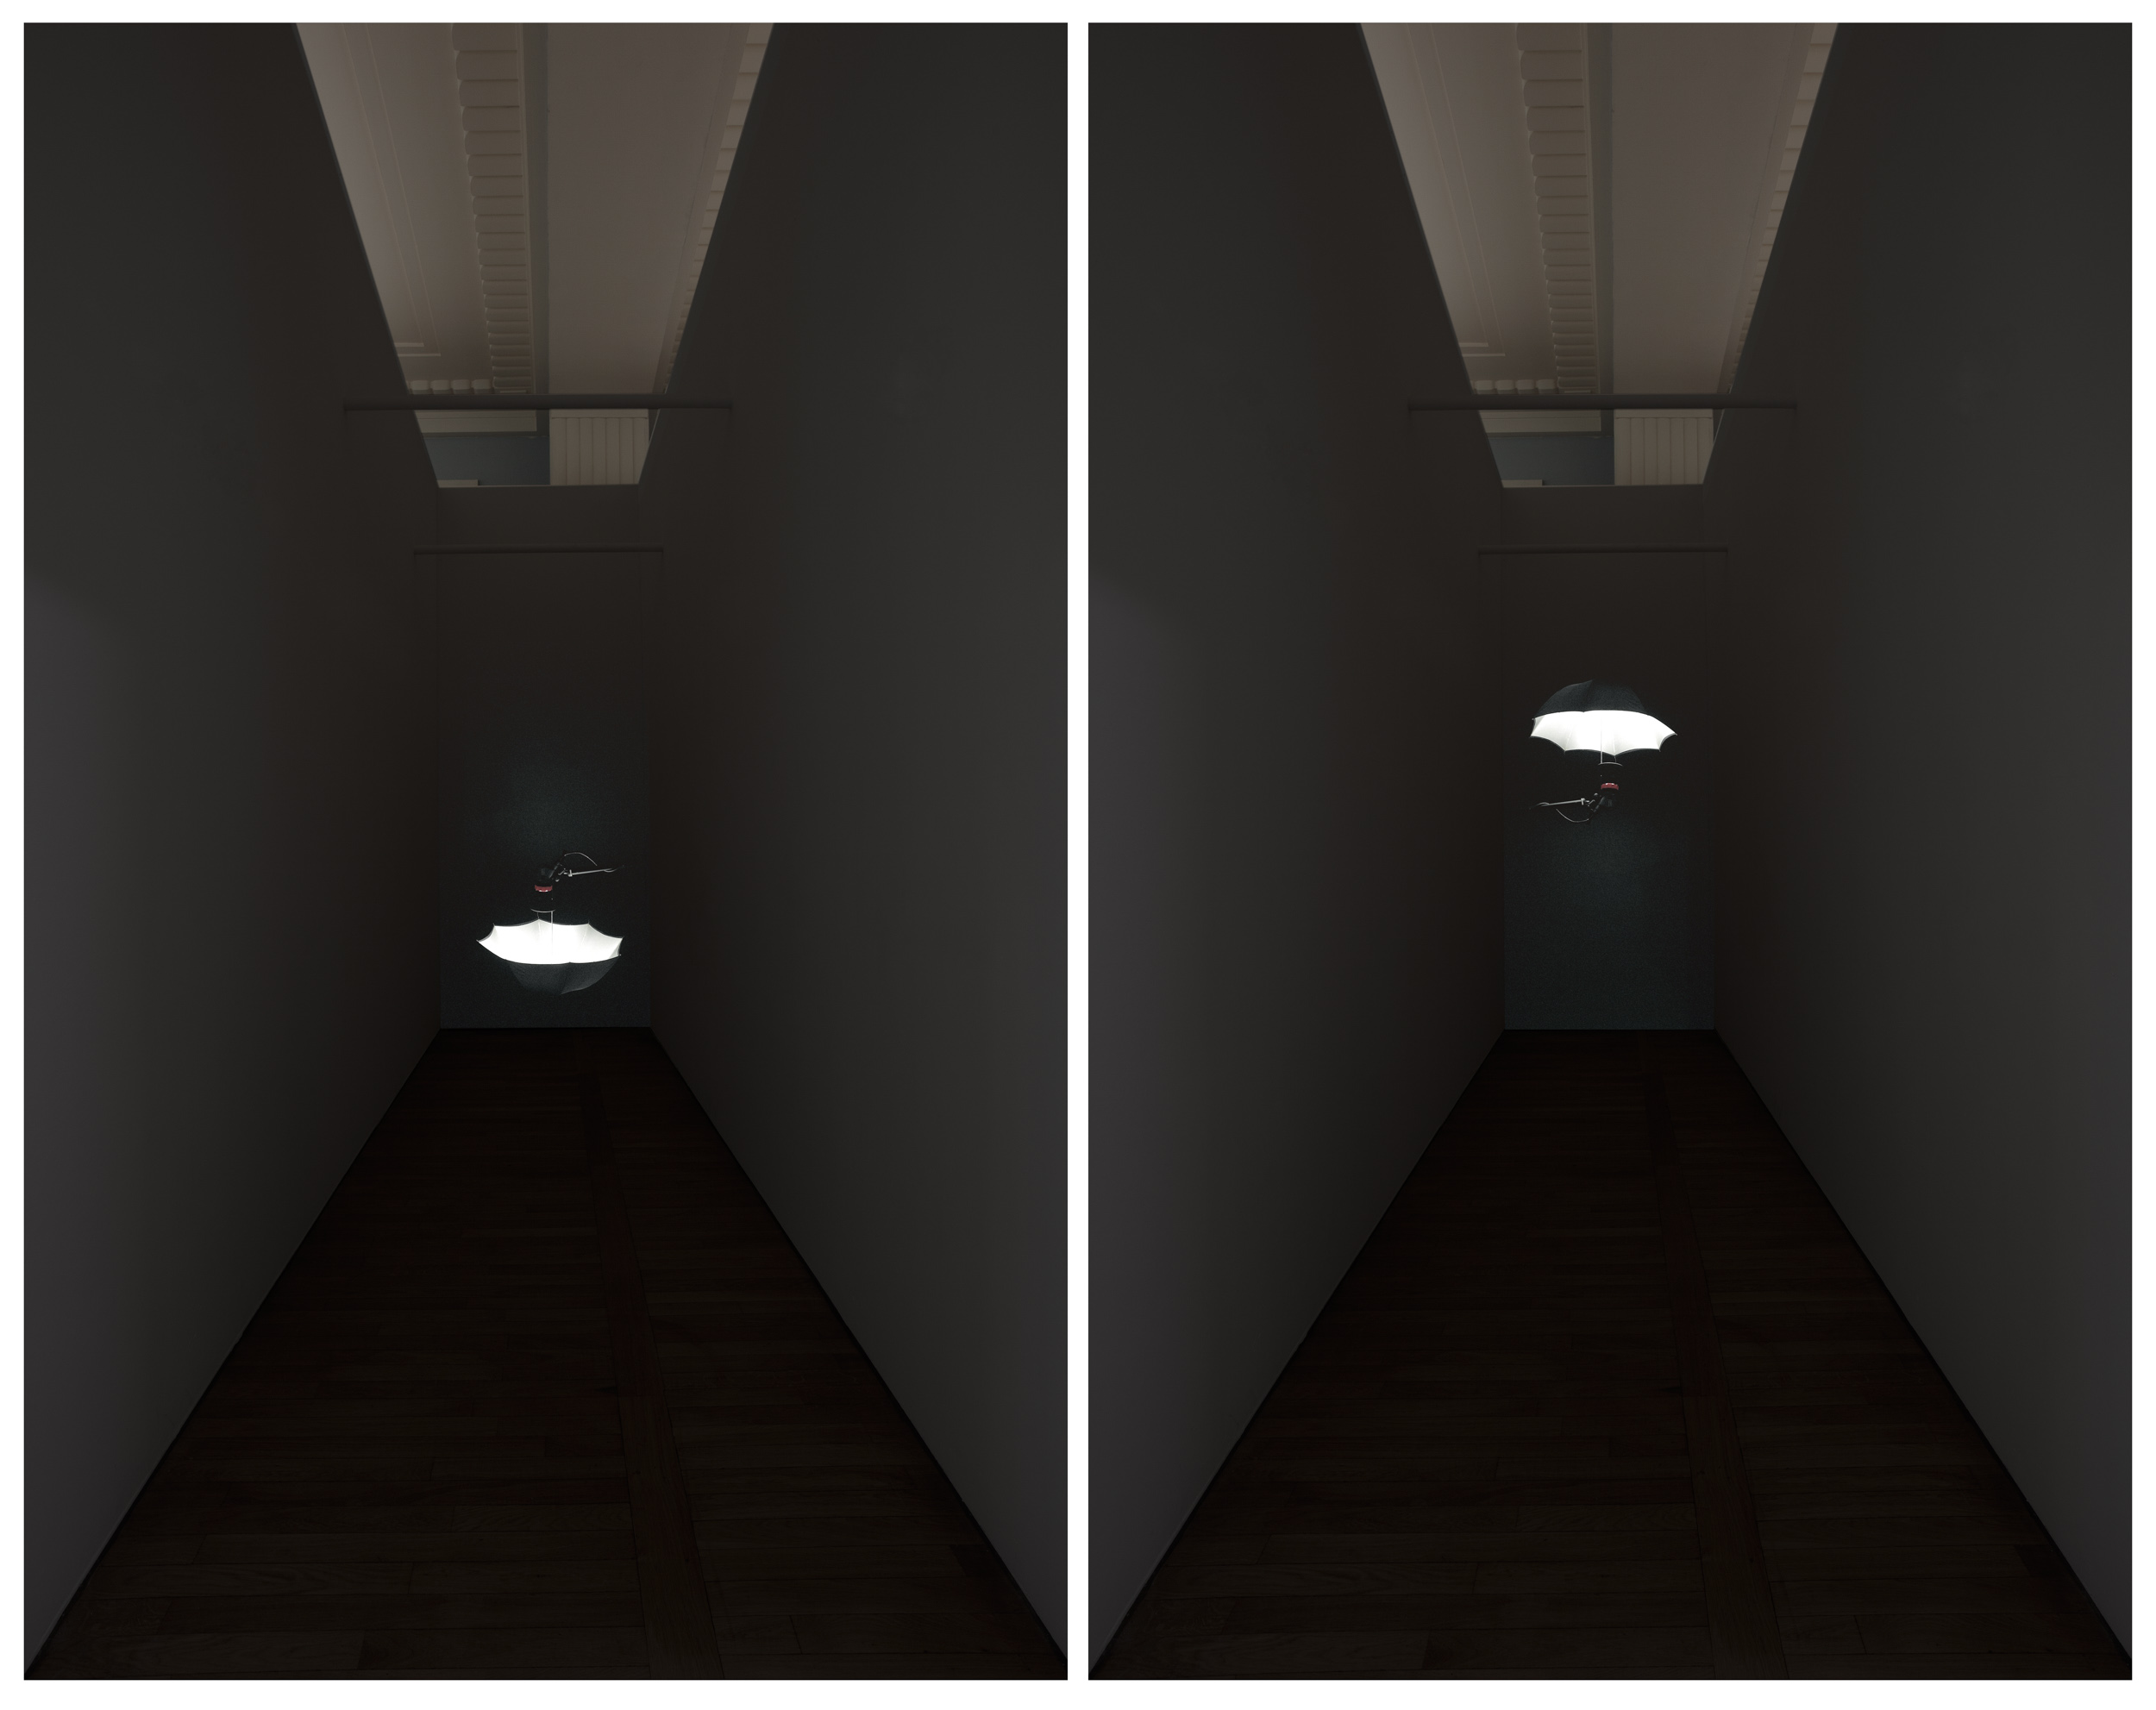 Vue d'installation / Installation view : Casino Luxembourg – Forum d'art contemporain, 2010